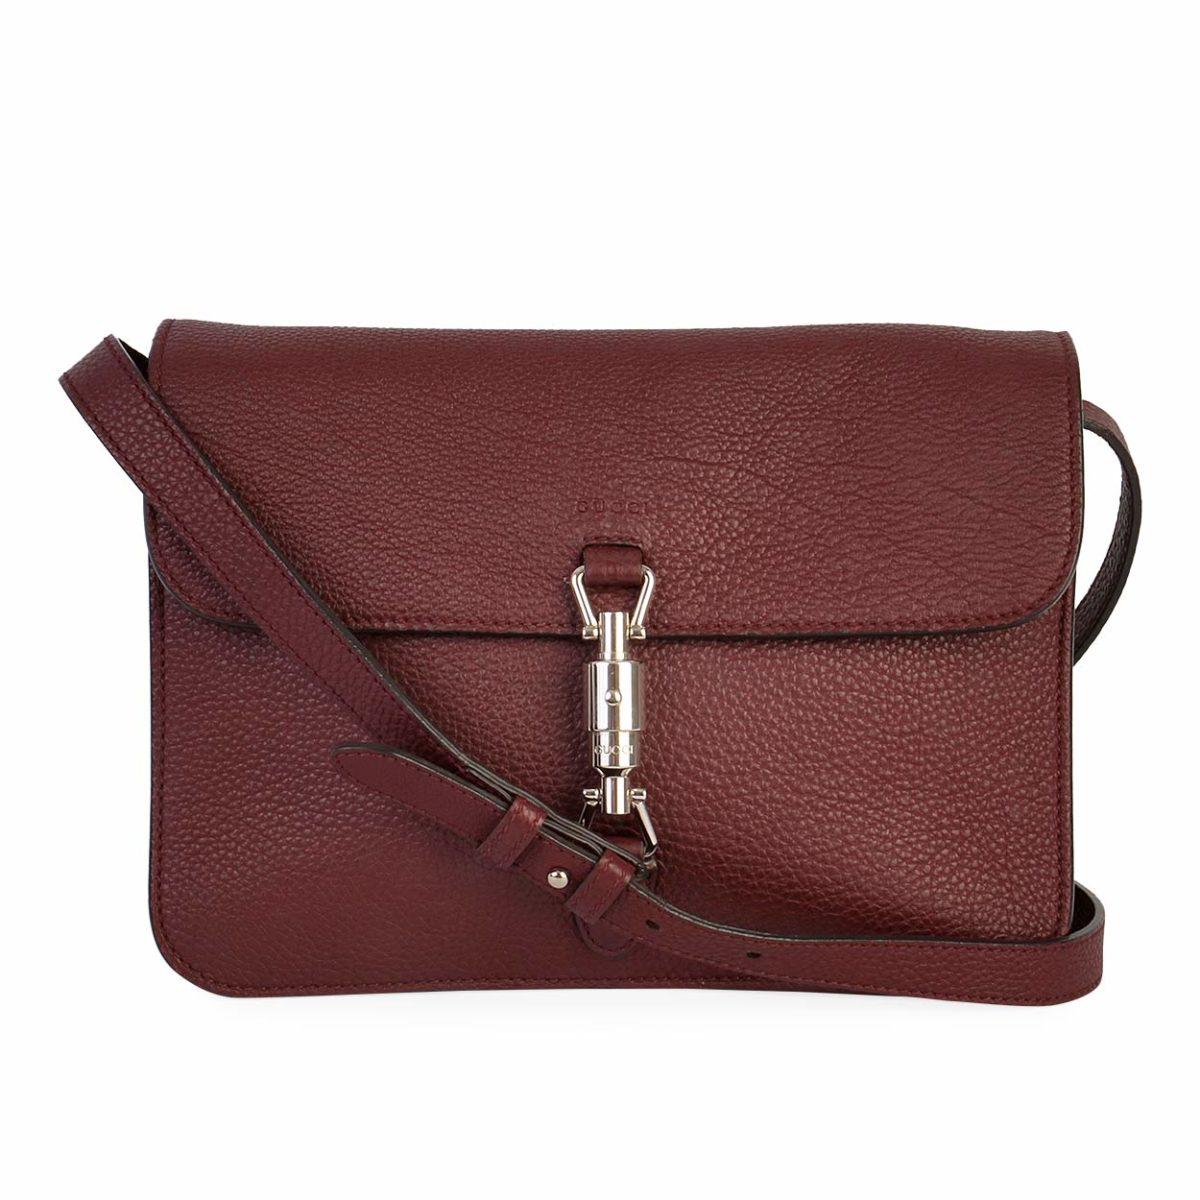 dba12d80cc78 GUCCI Pebbled Leather Jackie Flap Shoulder Bag Burgundy | Luxity